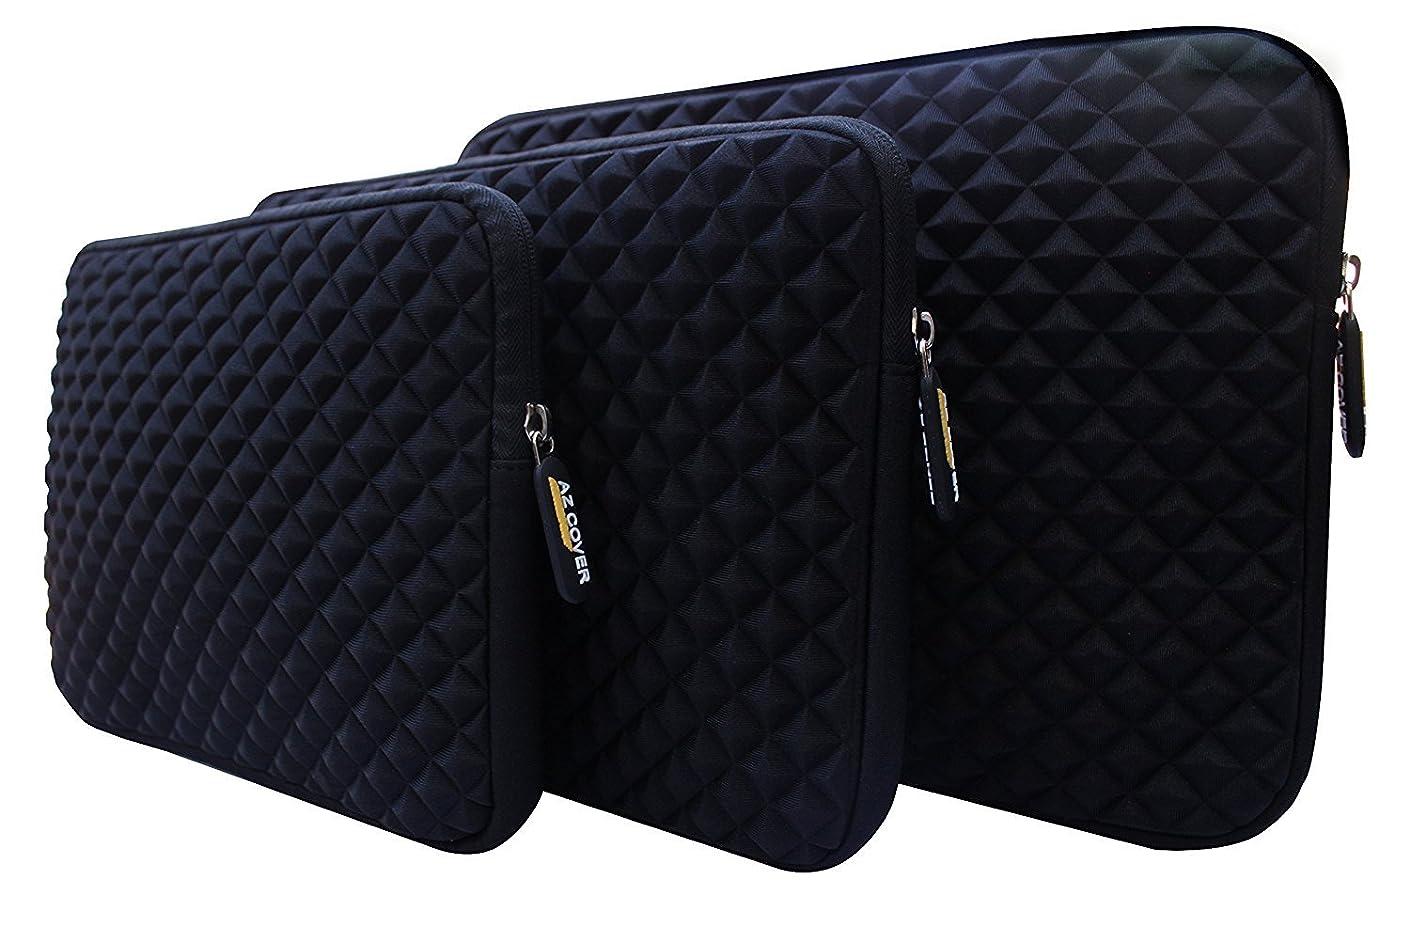 AZ-Cover 14-Inch Simplicity Stylish Diamond Foam Shock-Resistant Neoprene Sleeve (Black) For Lenovo ThinkPad T440s 20AR001DUS 14-Inch Laptop 1.9 GHz Intel Core i5-4288U